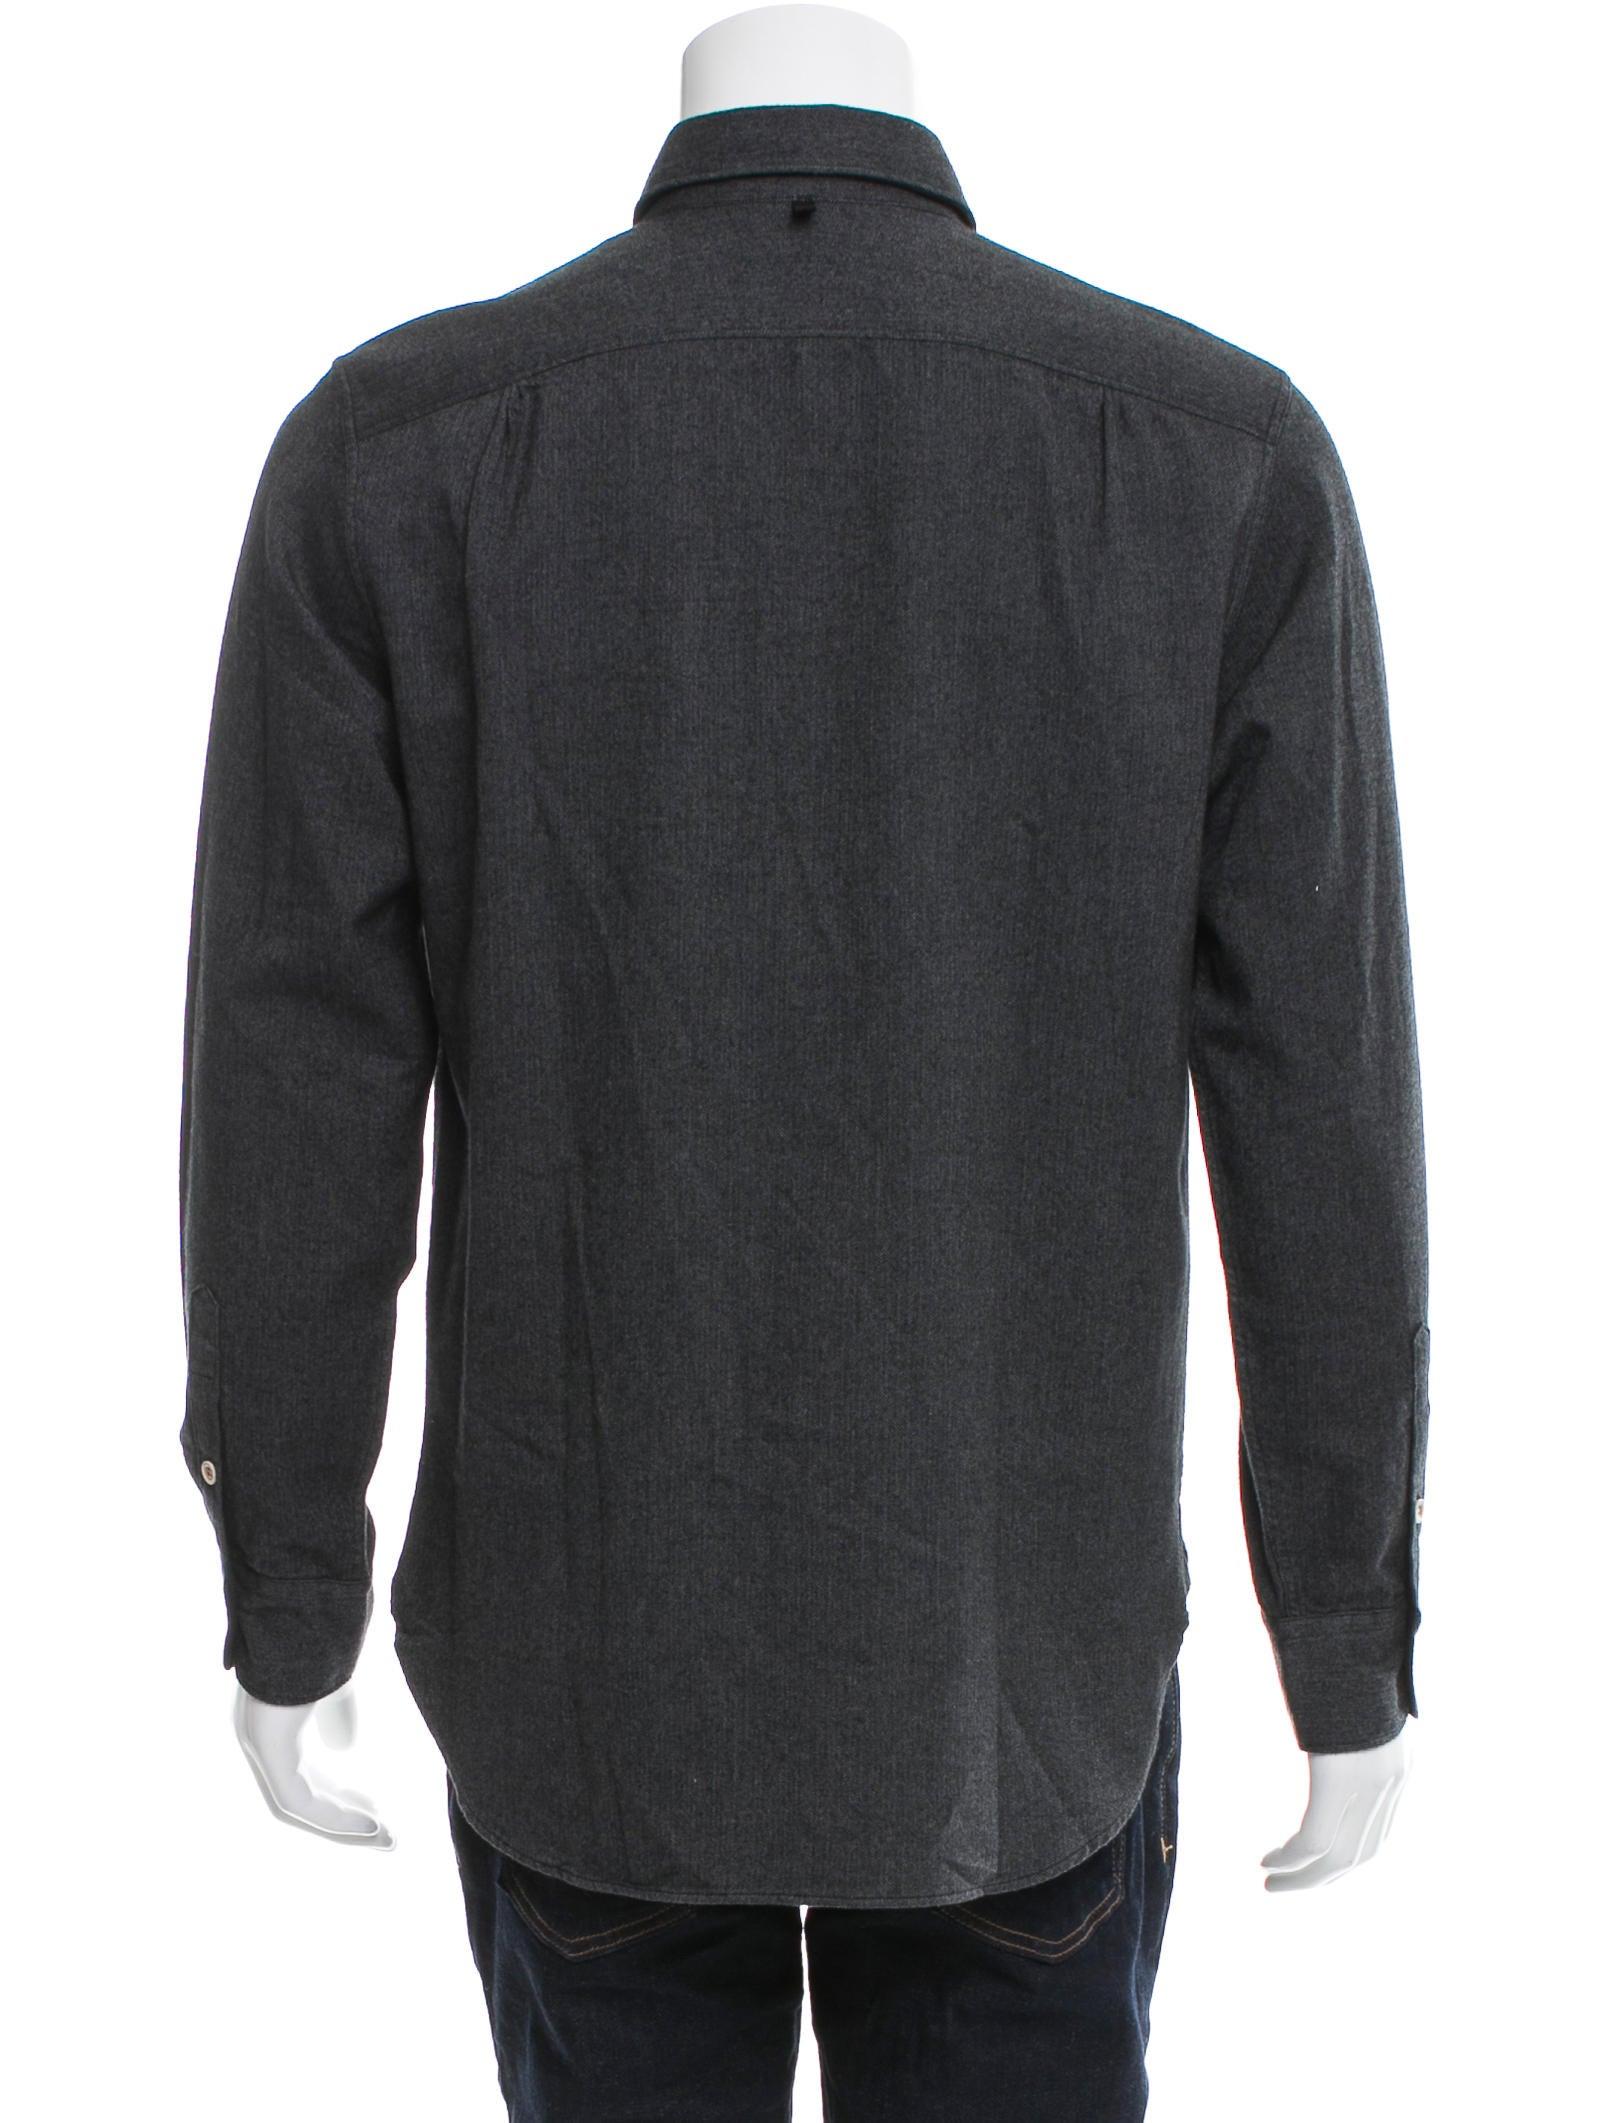 Rag Bone Herringbone Button Up Shirt W Tags Clothing